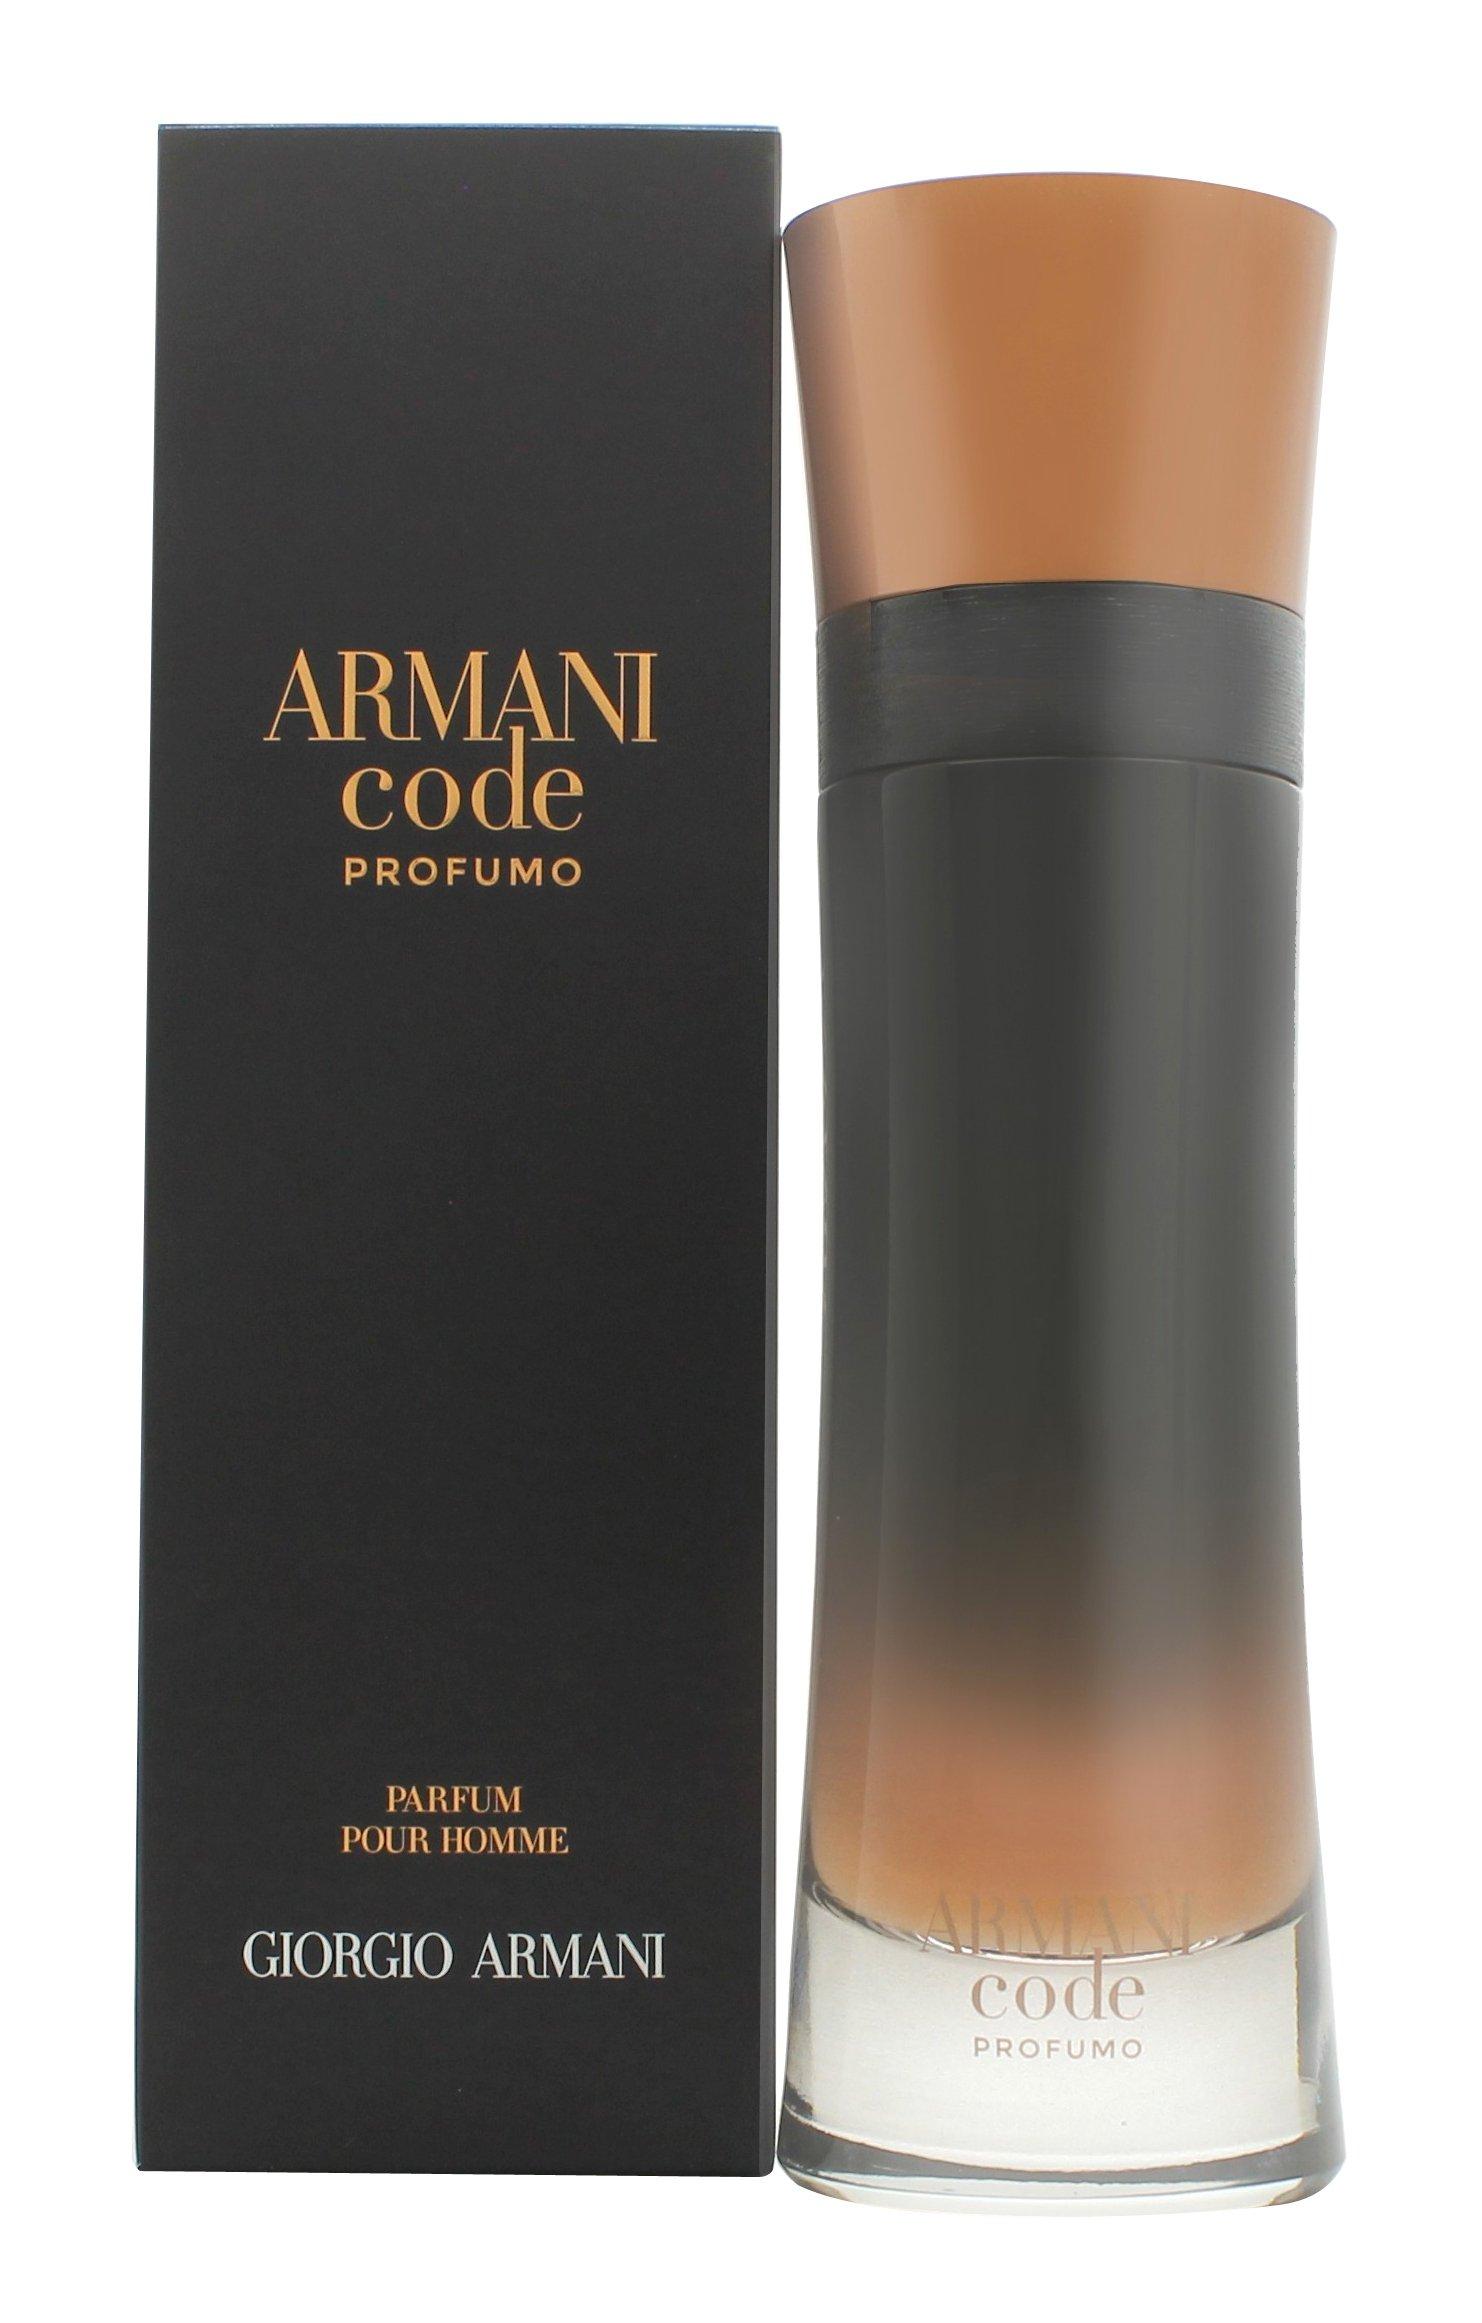 Giorgio Armani Code Profumo EDP Spray for Men, 3.7 Ounce